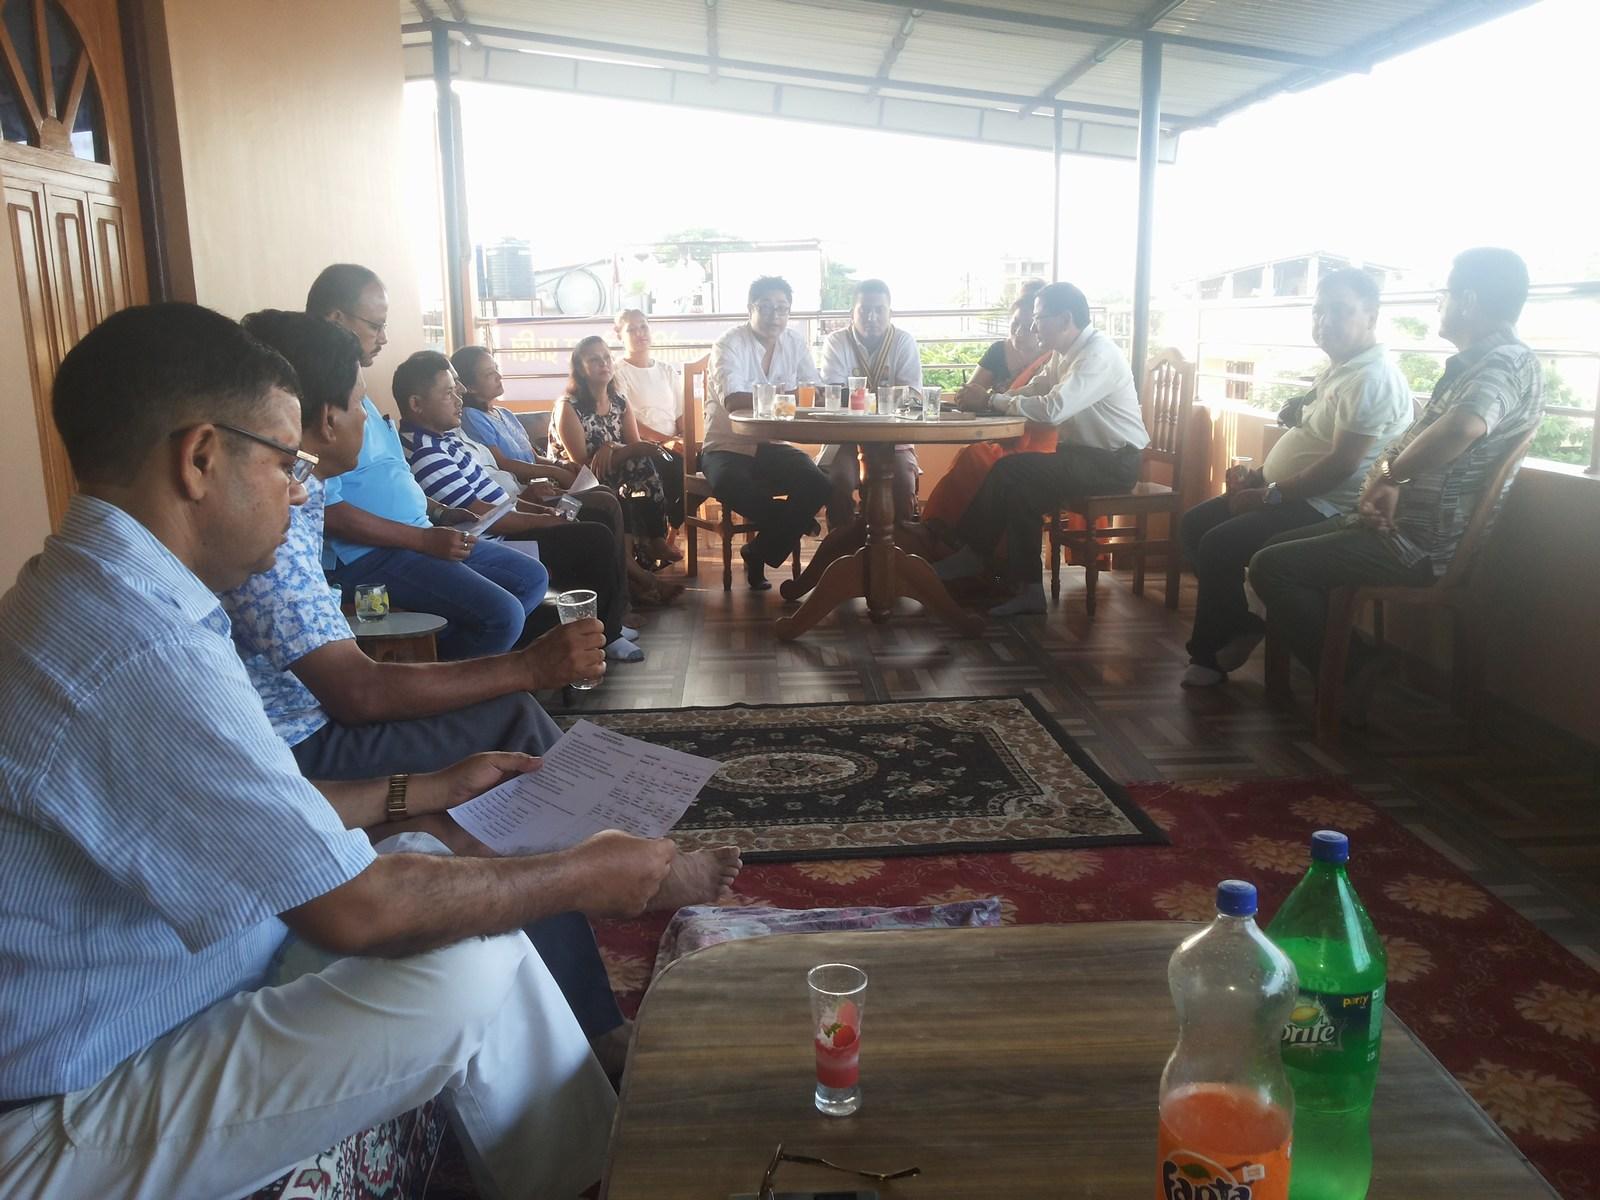 Club-Assembly-2015-16-Rotary-Club-of-Kakarvitta-4